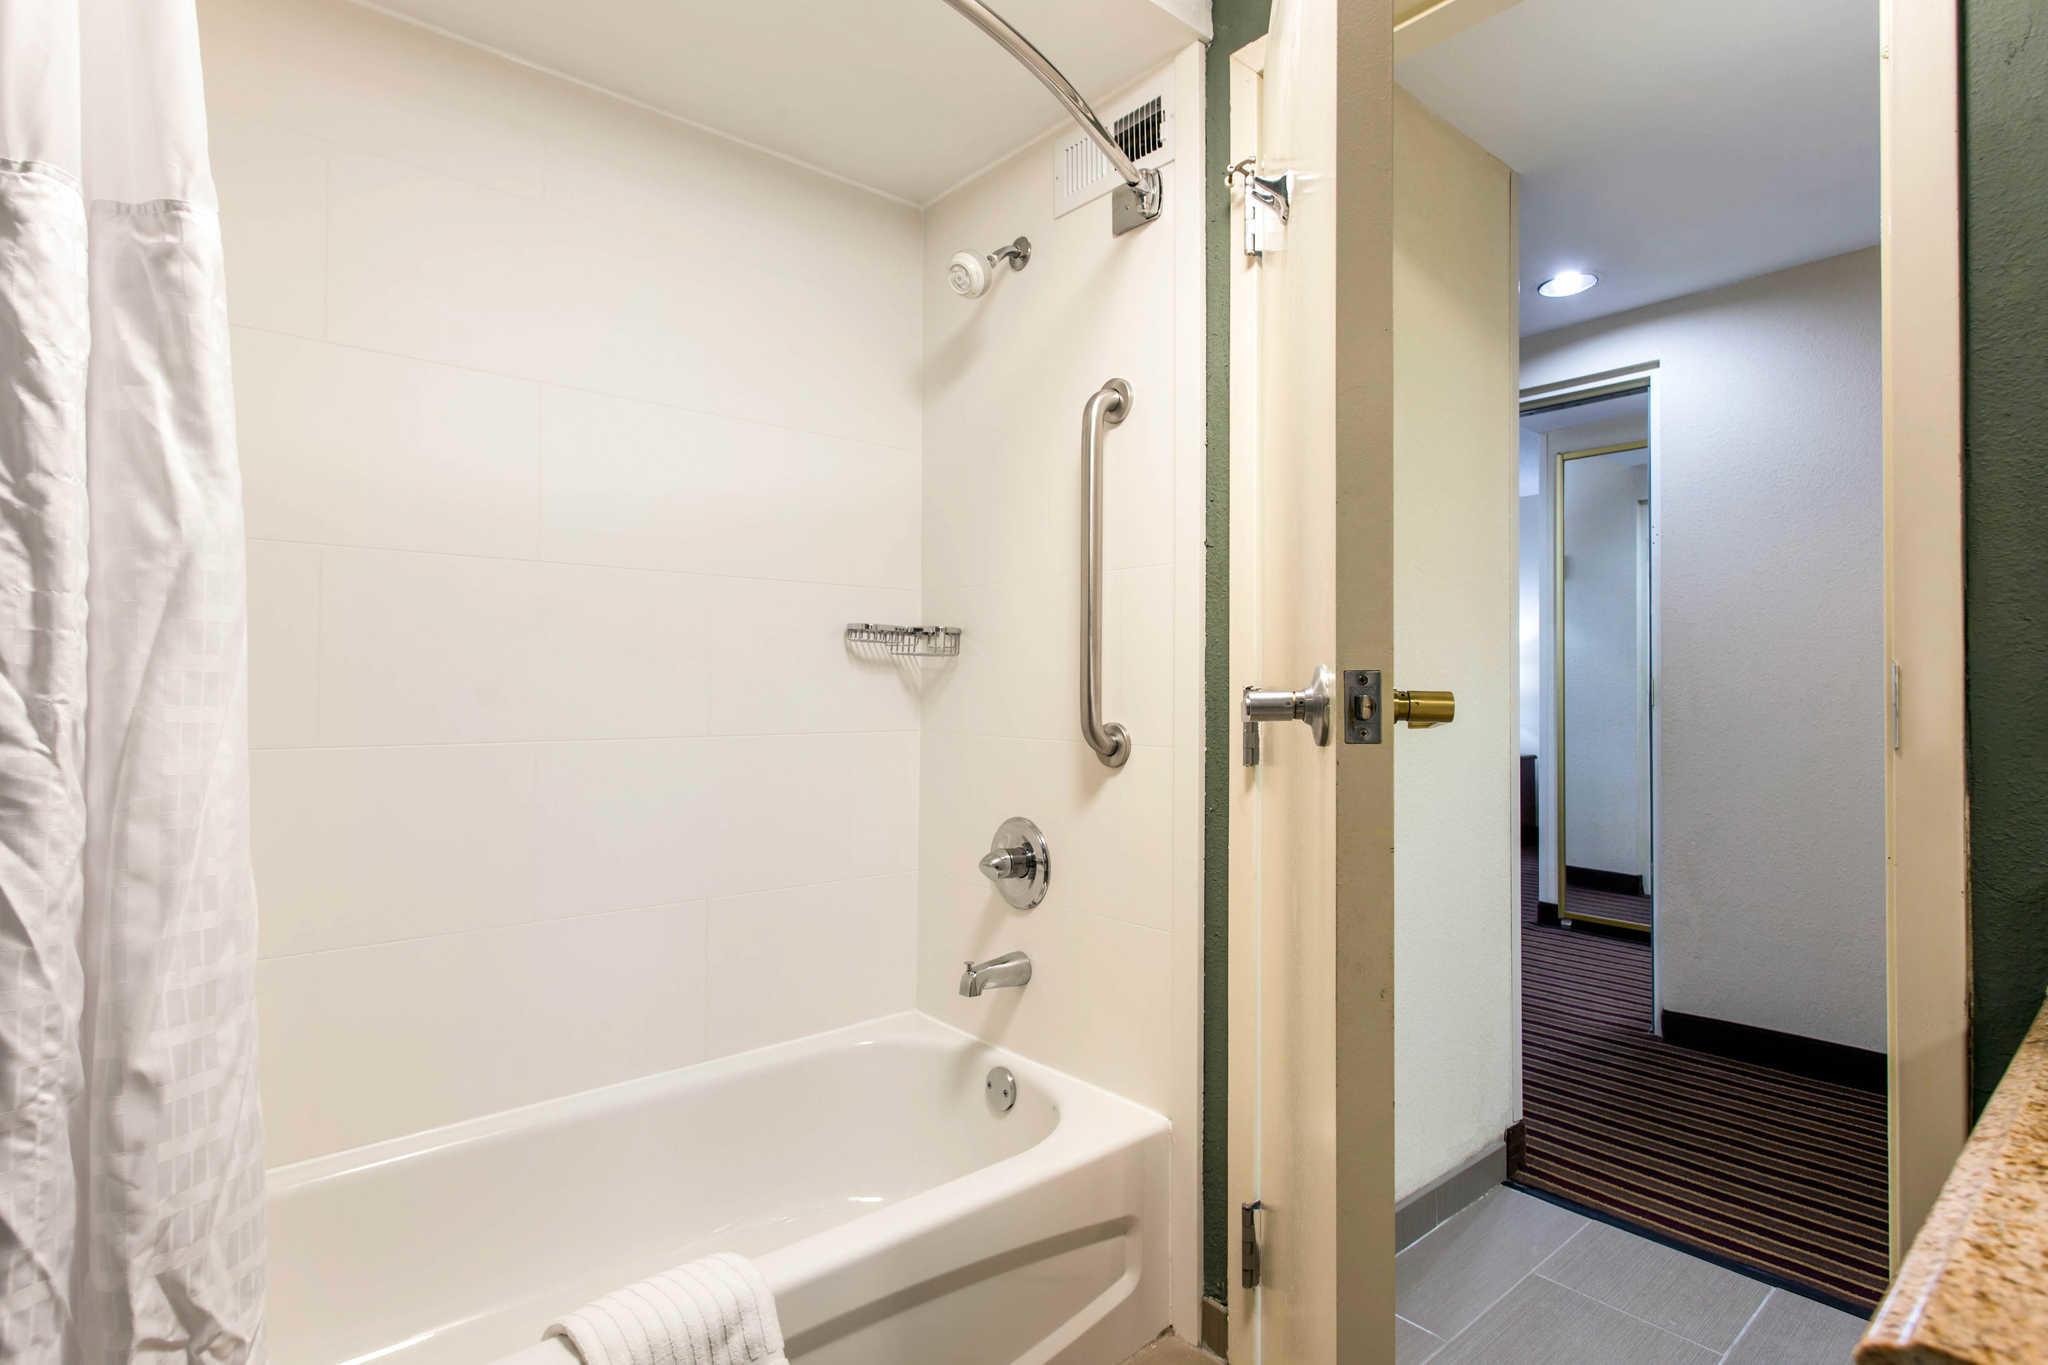 Comfort Inn & Suites Crabtree Valley image 22